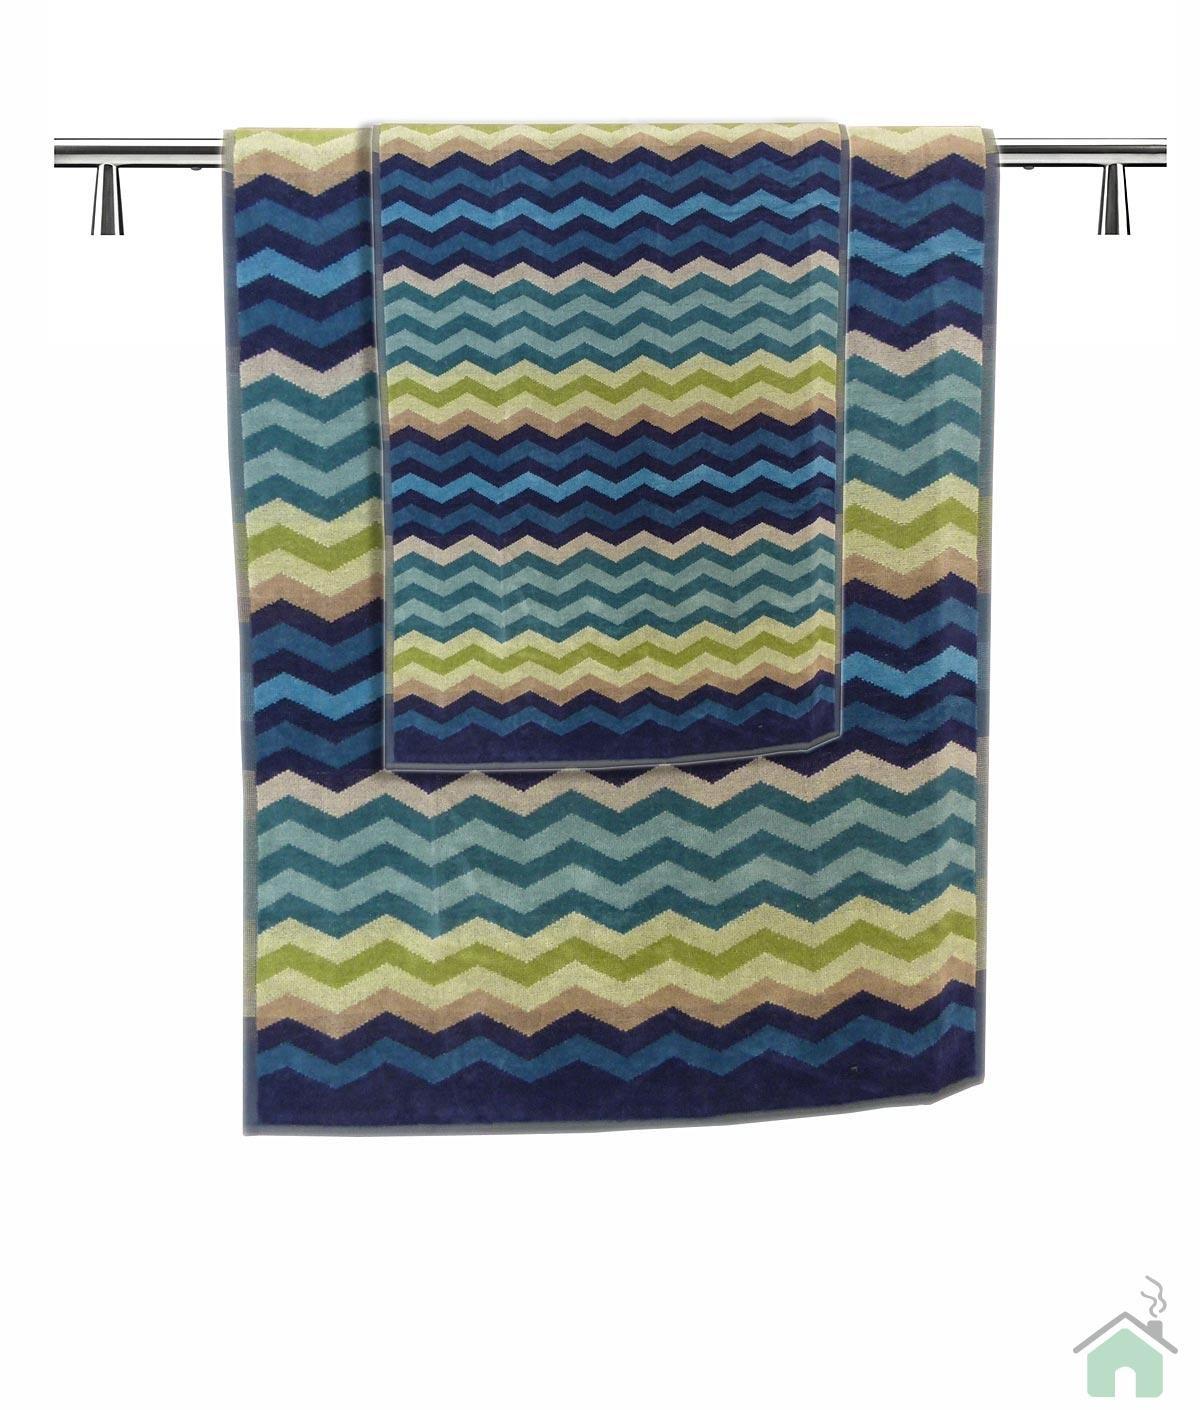 Set of 1 bath towel +2 hand towels Missoni Home Pete var.170 - zig-zag pattern